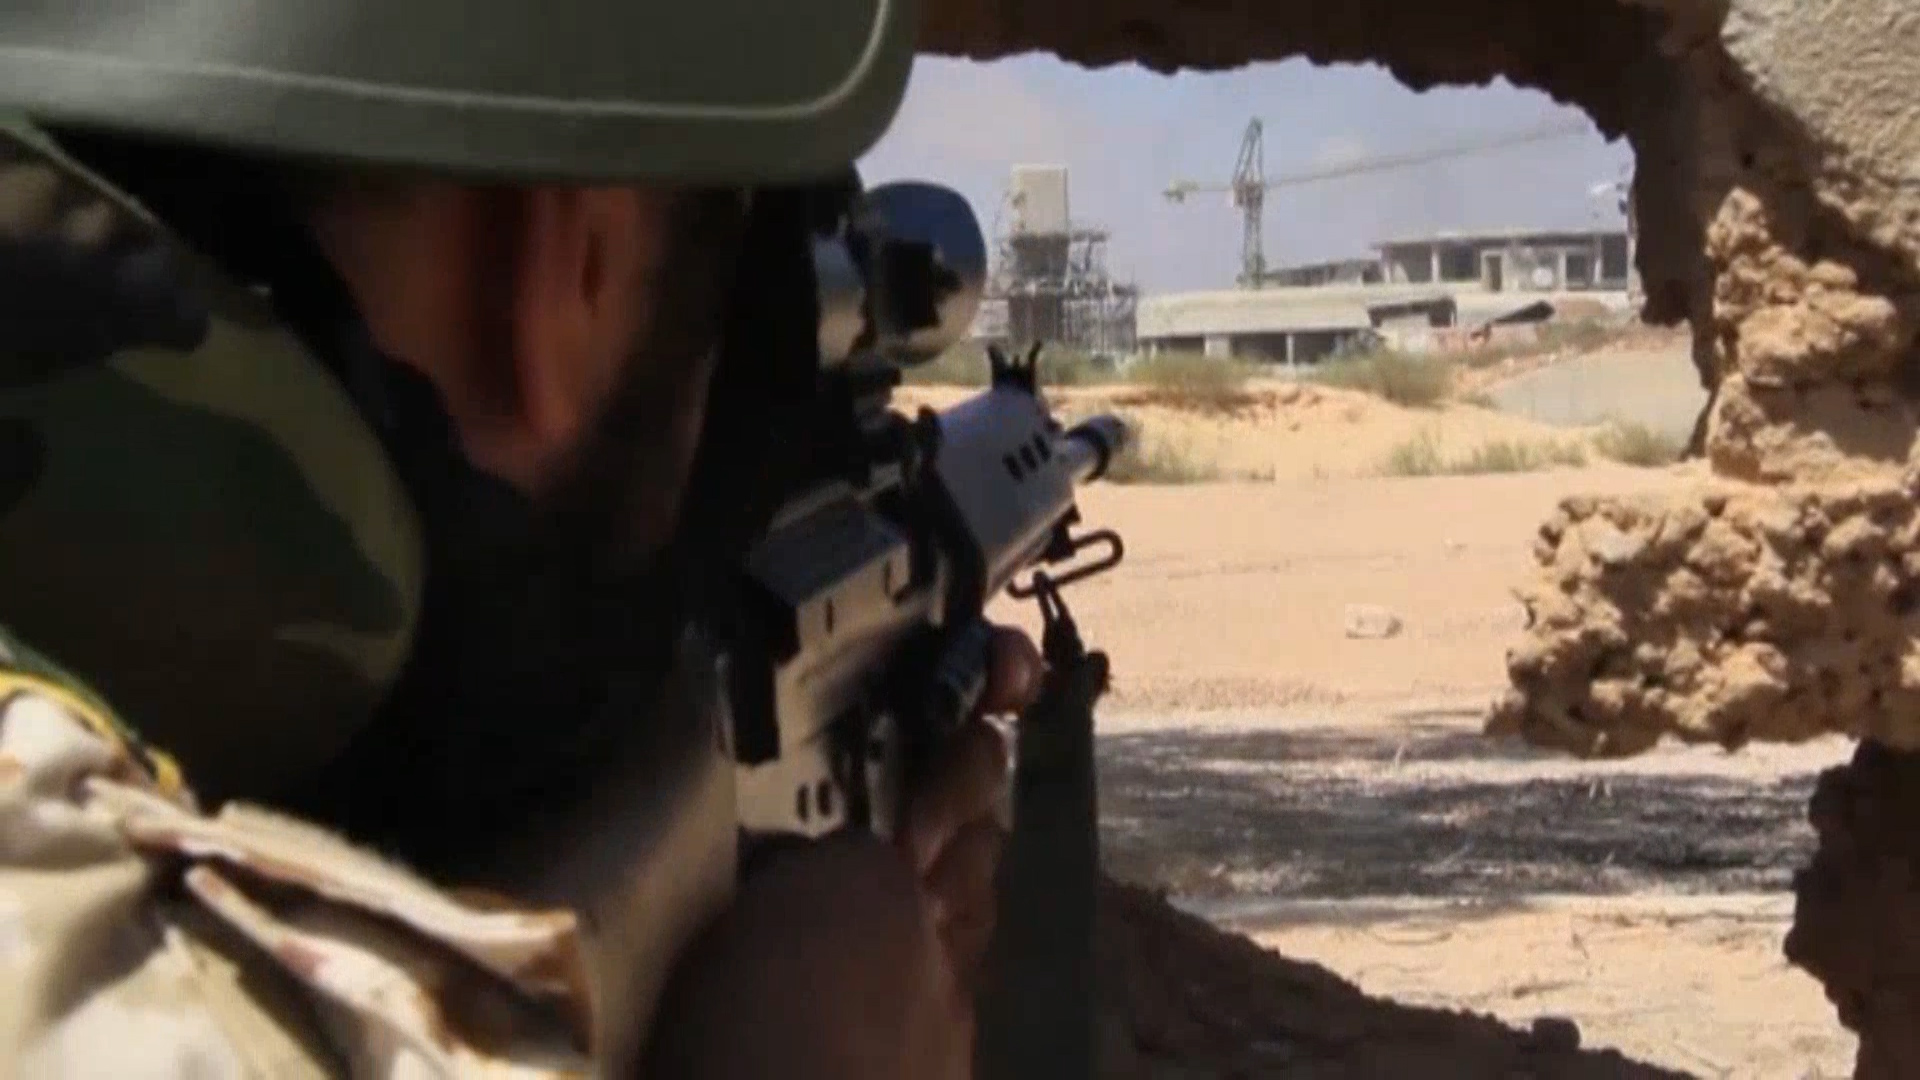 FO27R LIBYA SIRTE FIGHTING_08-11-16.mp4.00_00_19_21.Still001_1470954791533.jpg